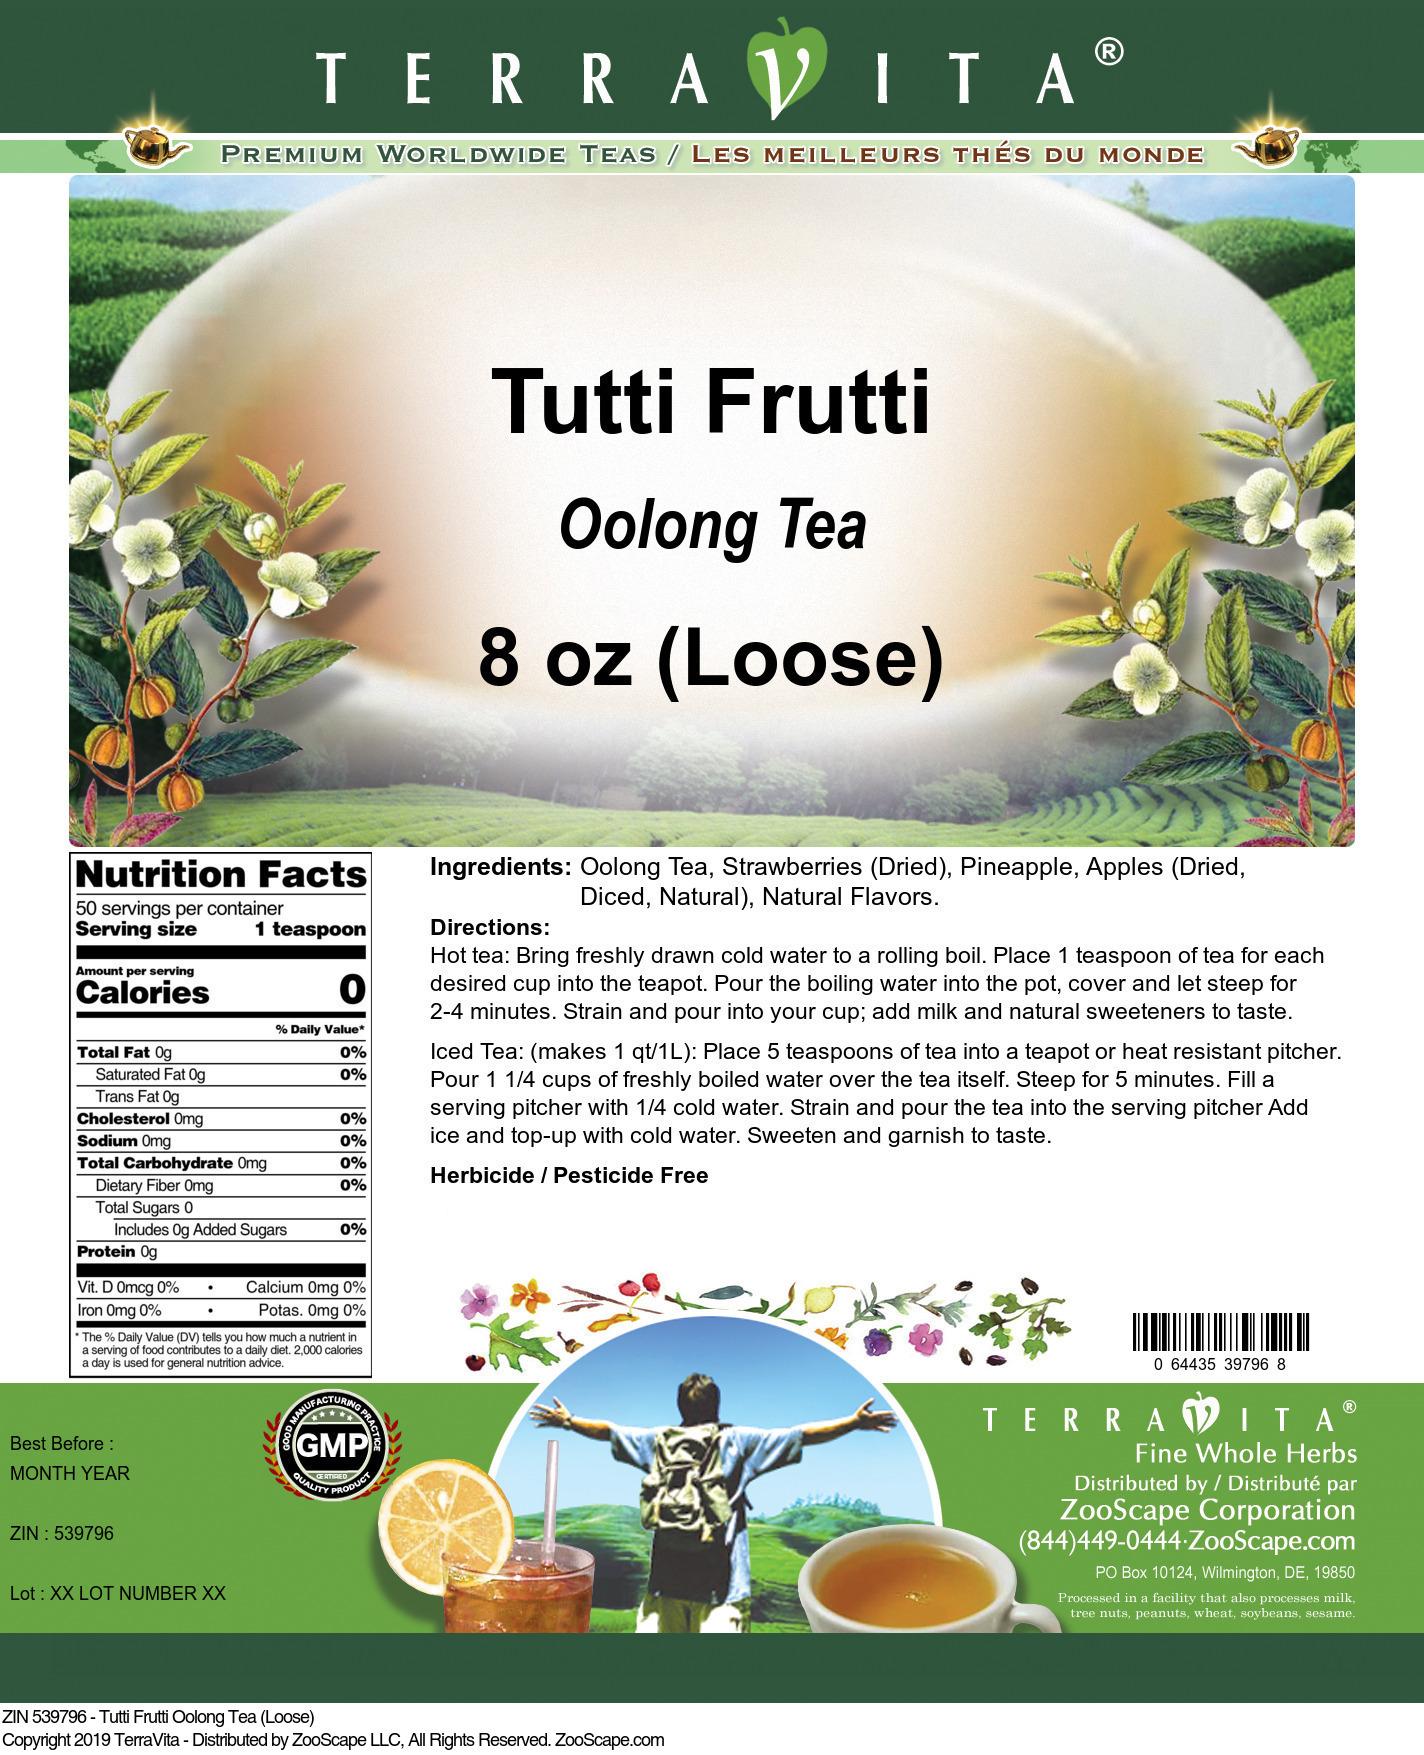 Tutti Frutti Oolong Tea (Loose)